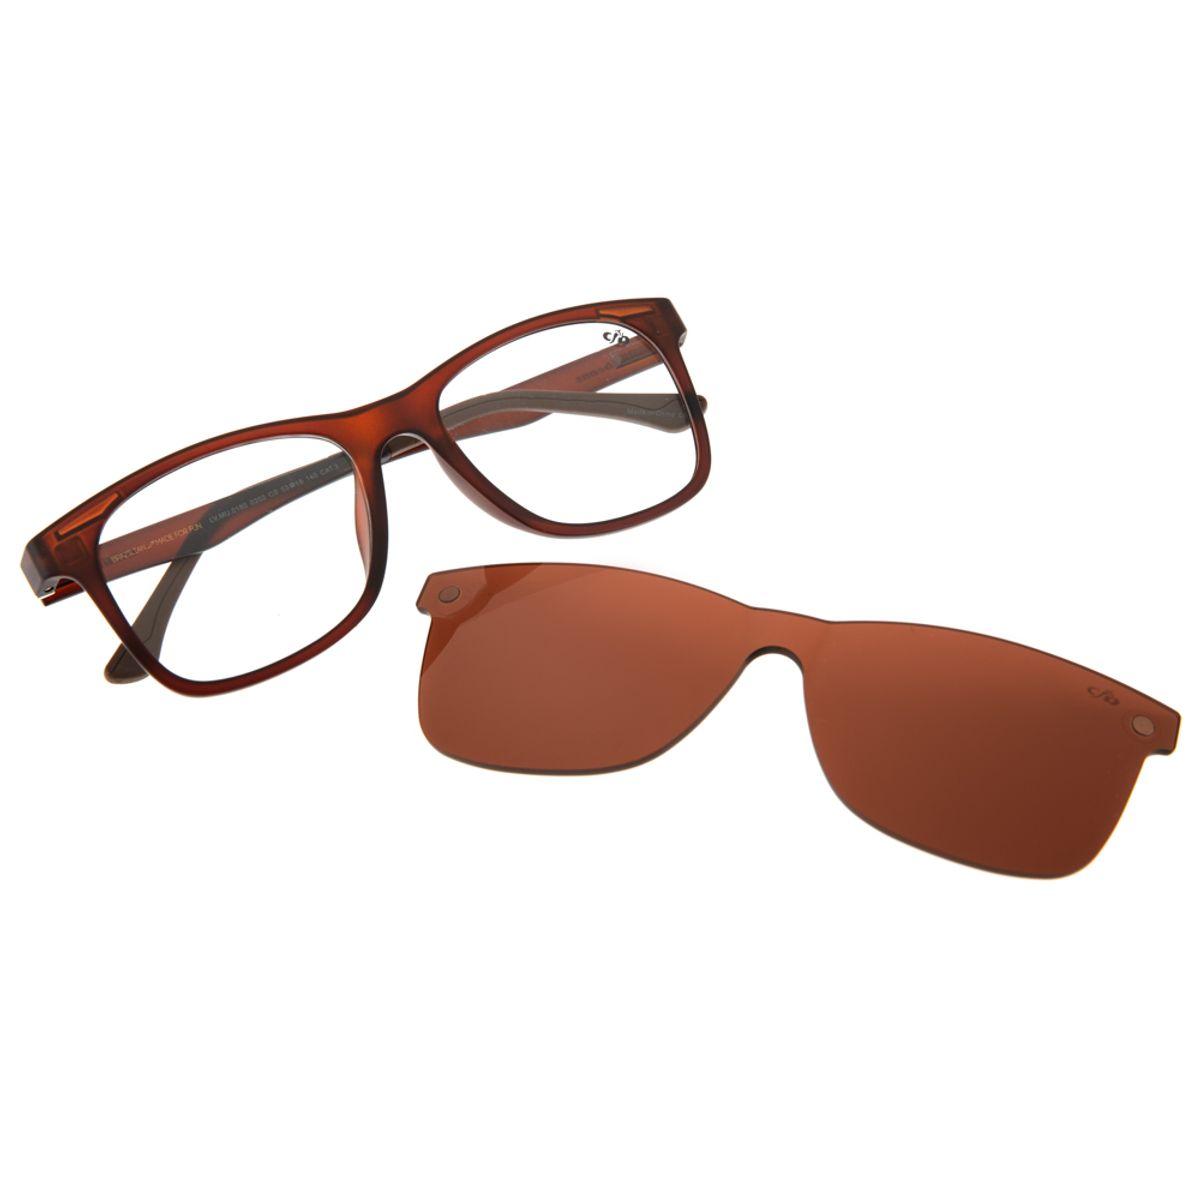 5be9f574c Armação para Óculos de Grau Chilli Beans Unissex Multi Clip On ...